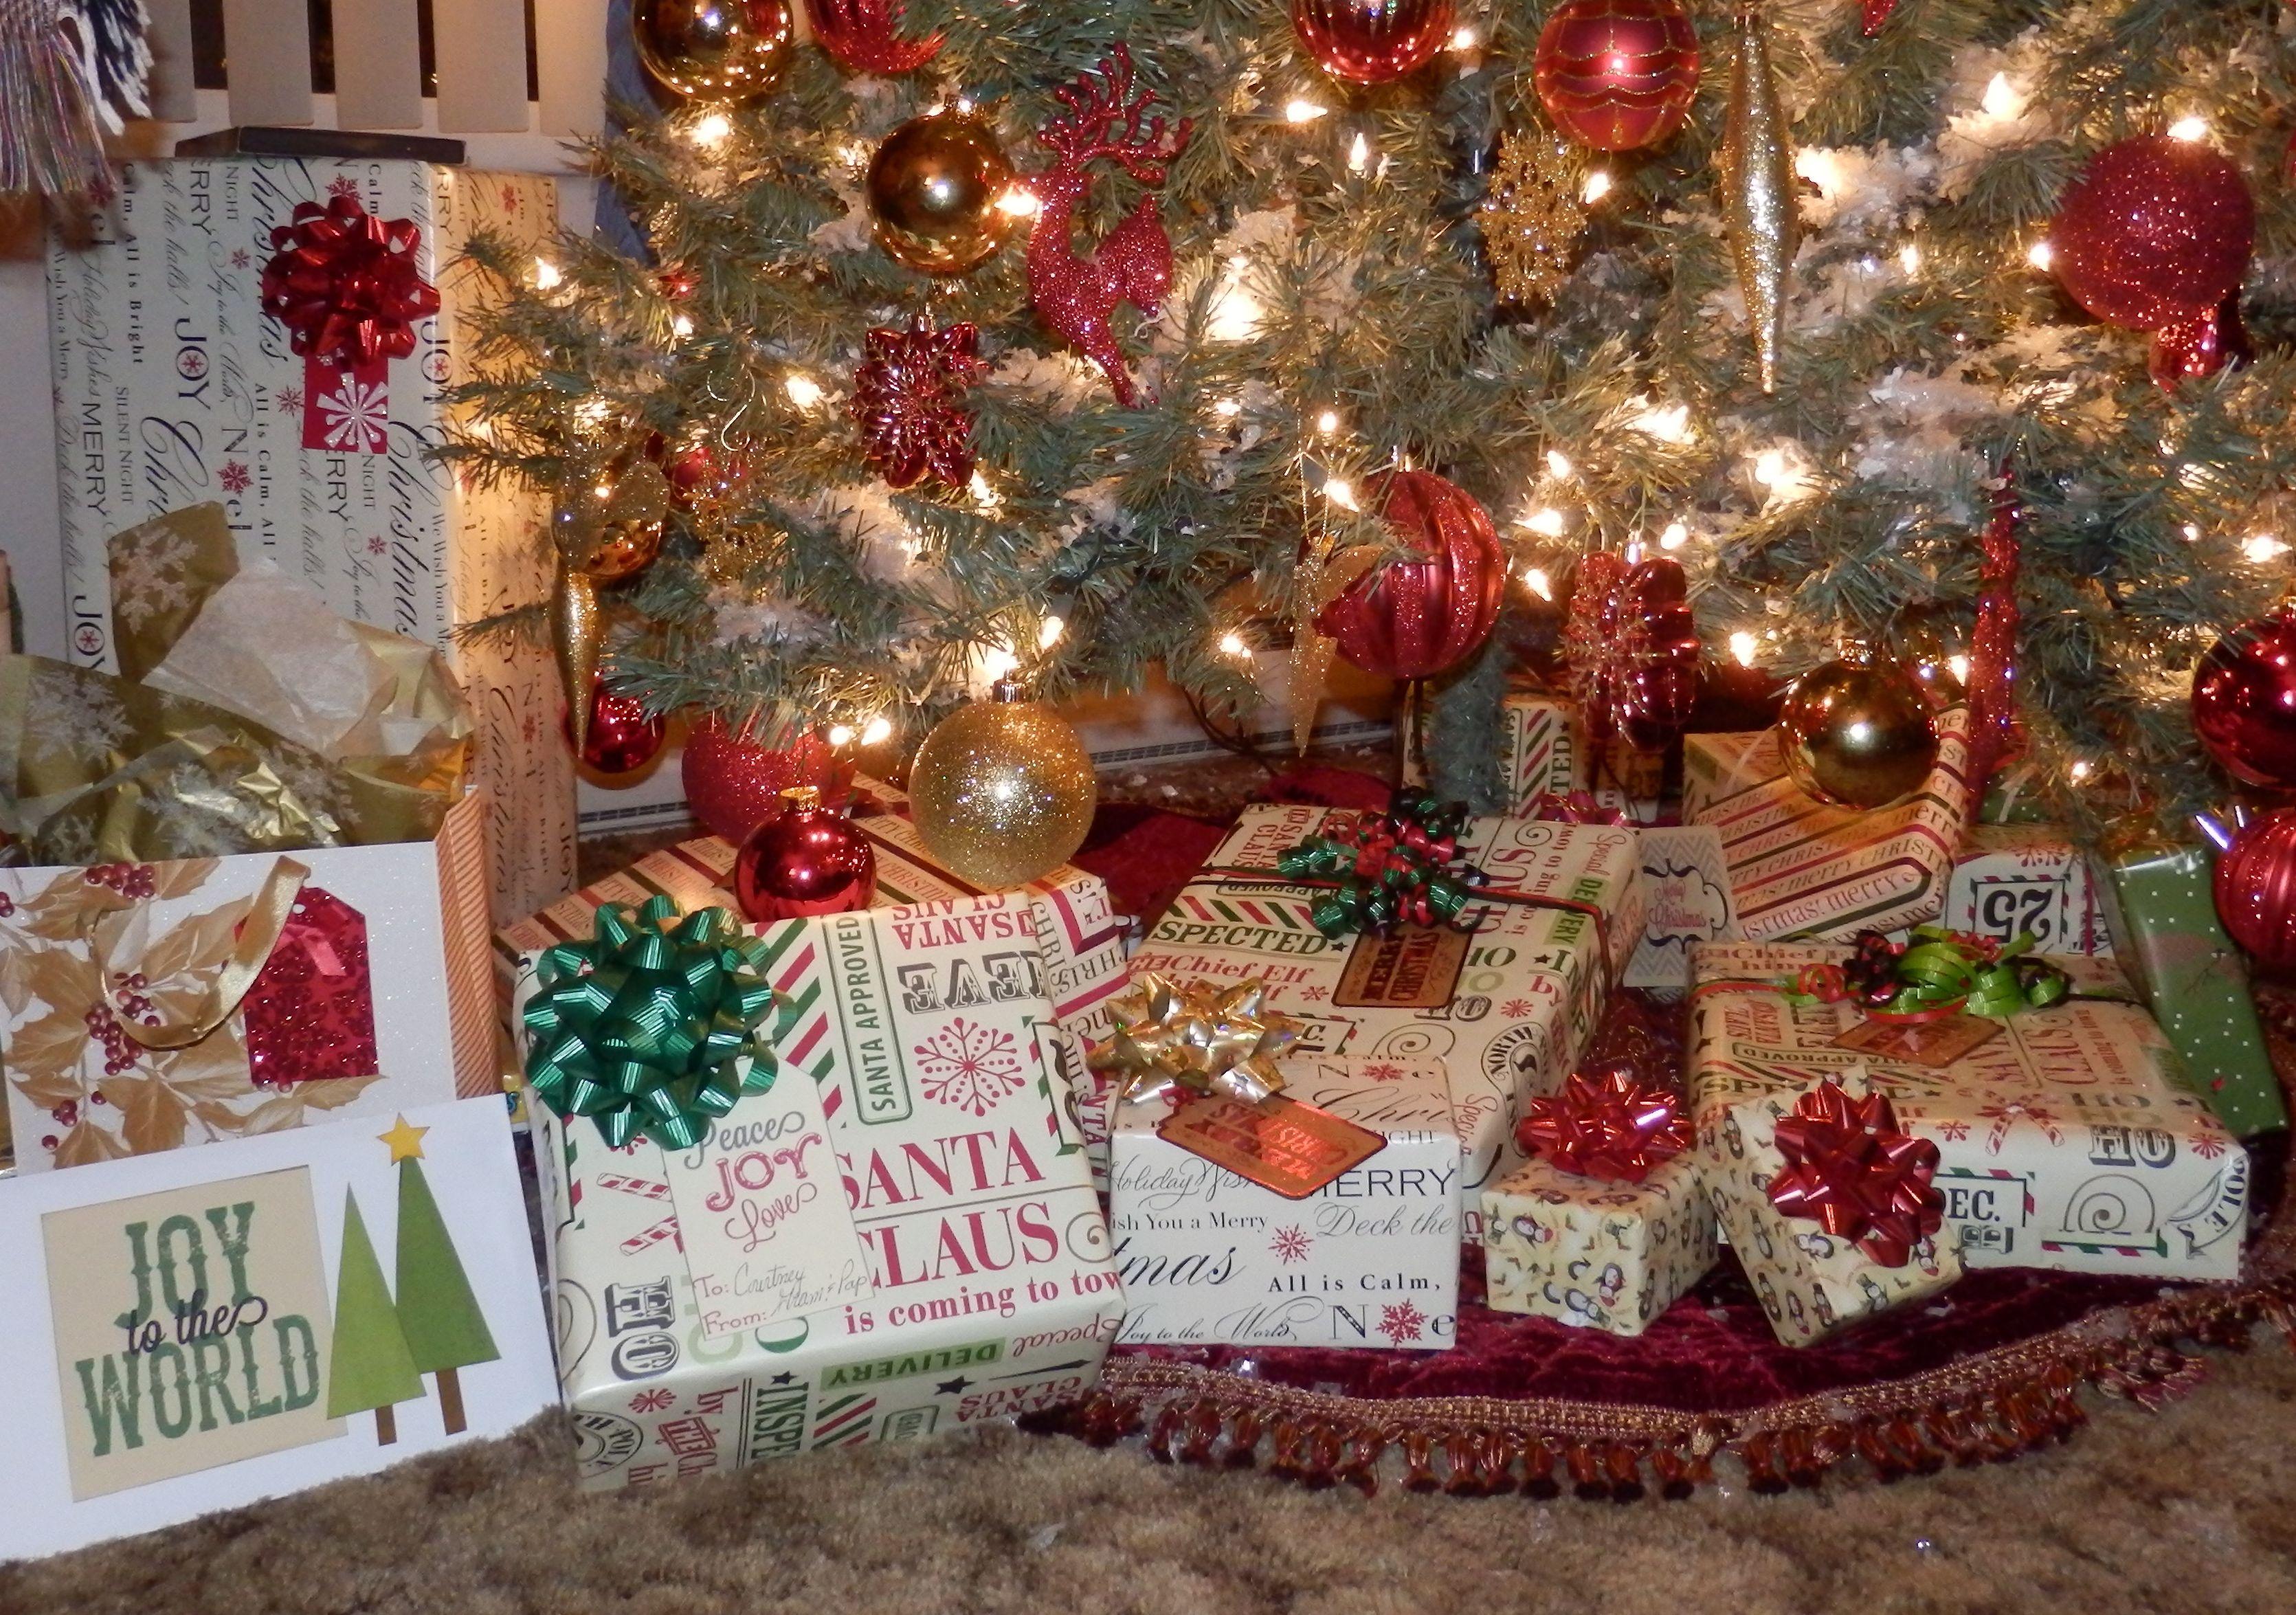 My 2013 Christmas Presents